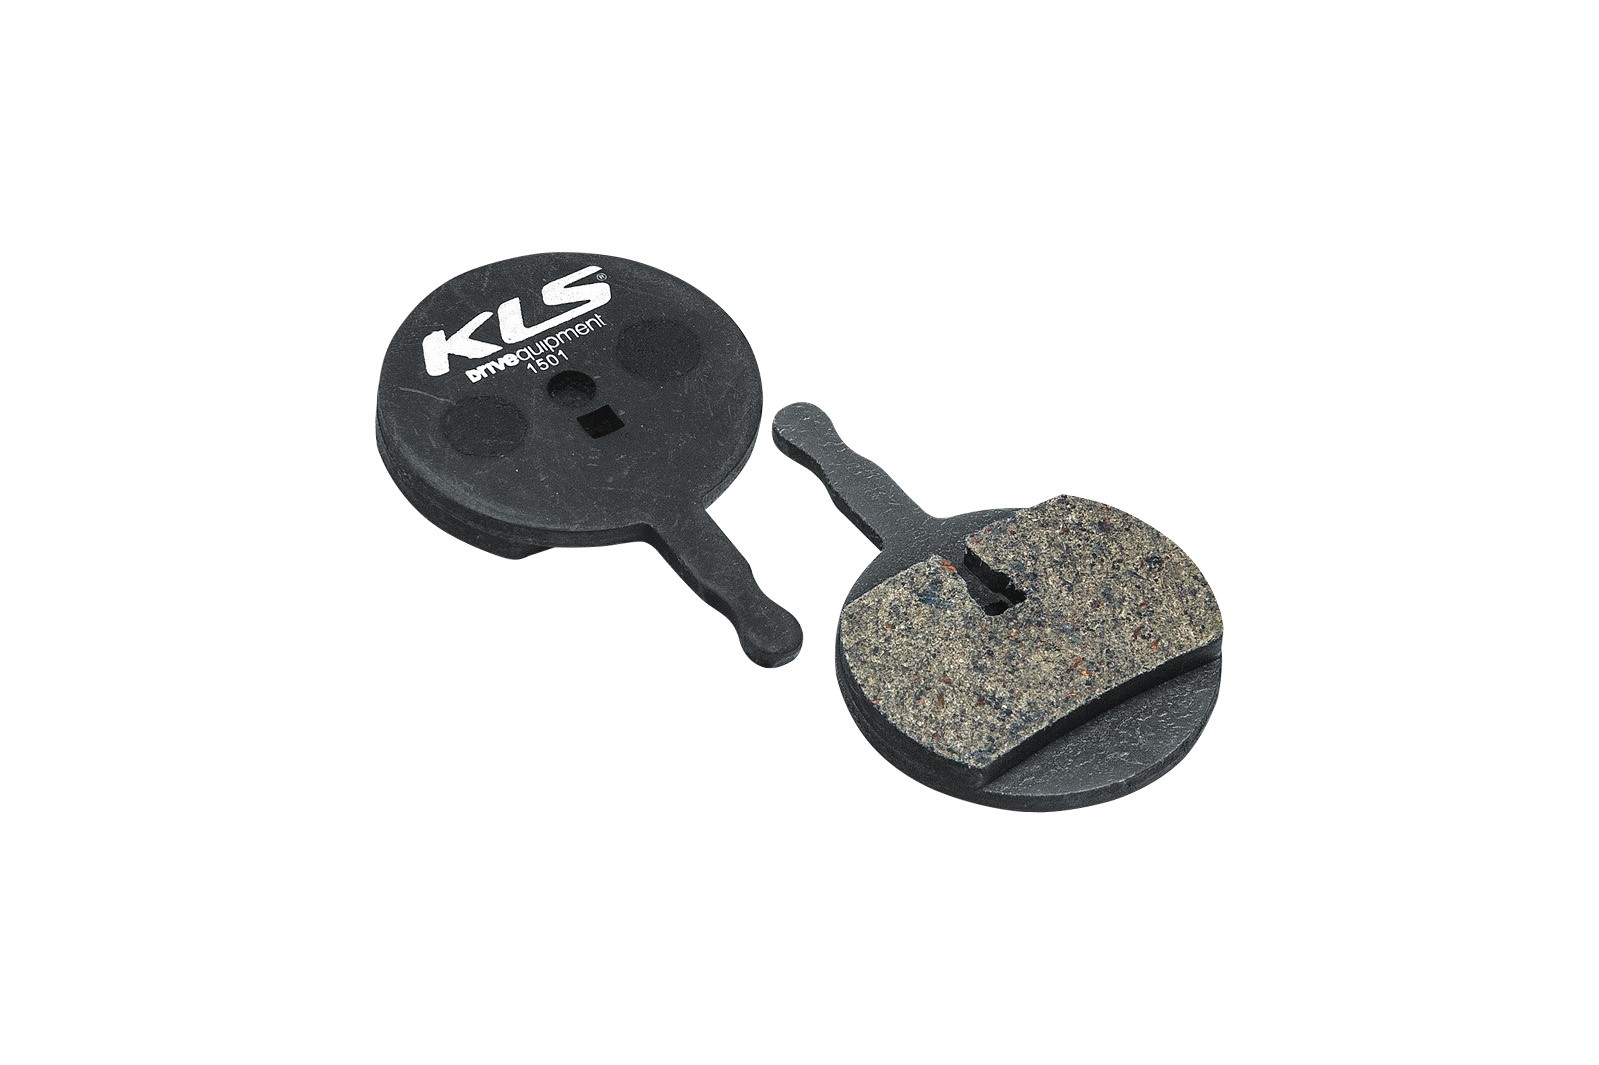 Brzdové destičky KLS D-15, organické